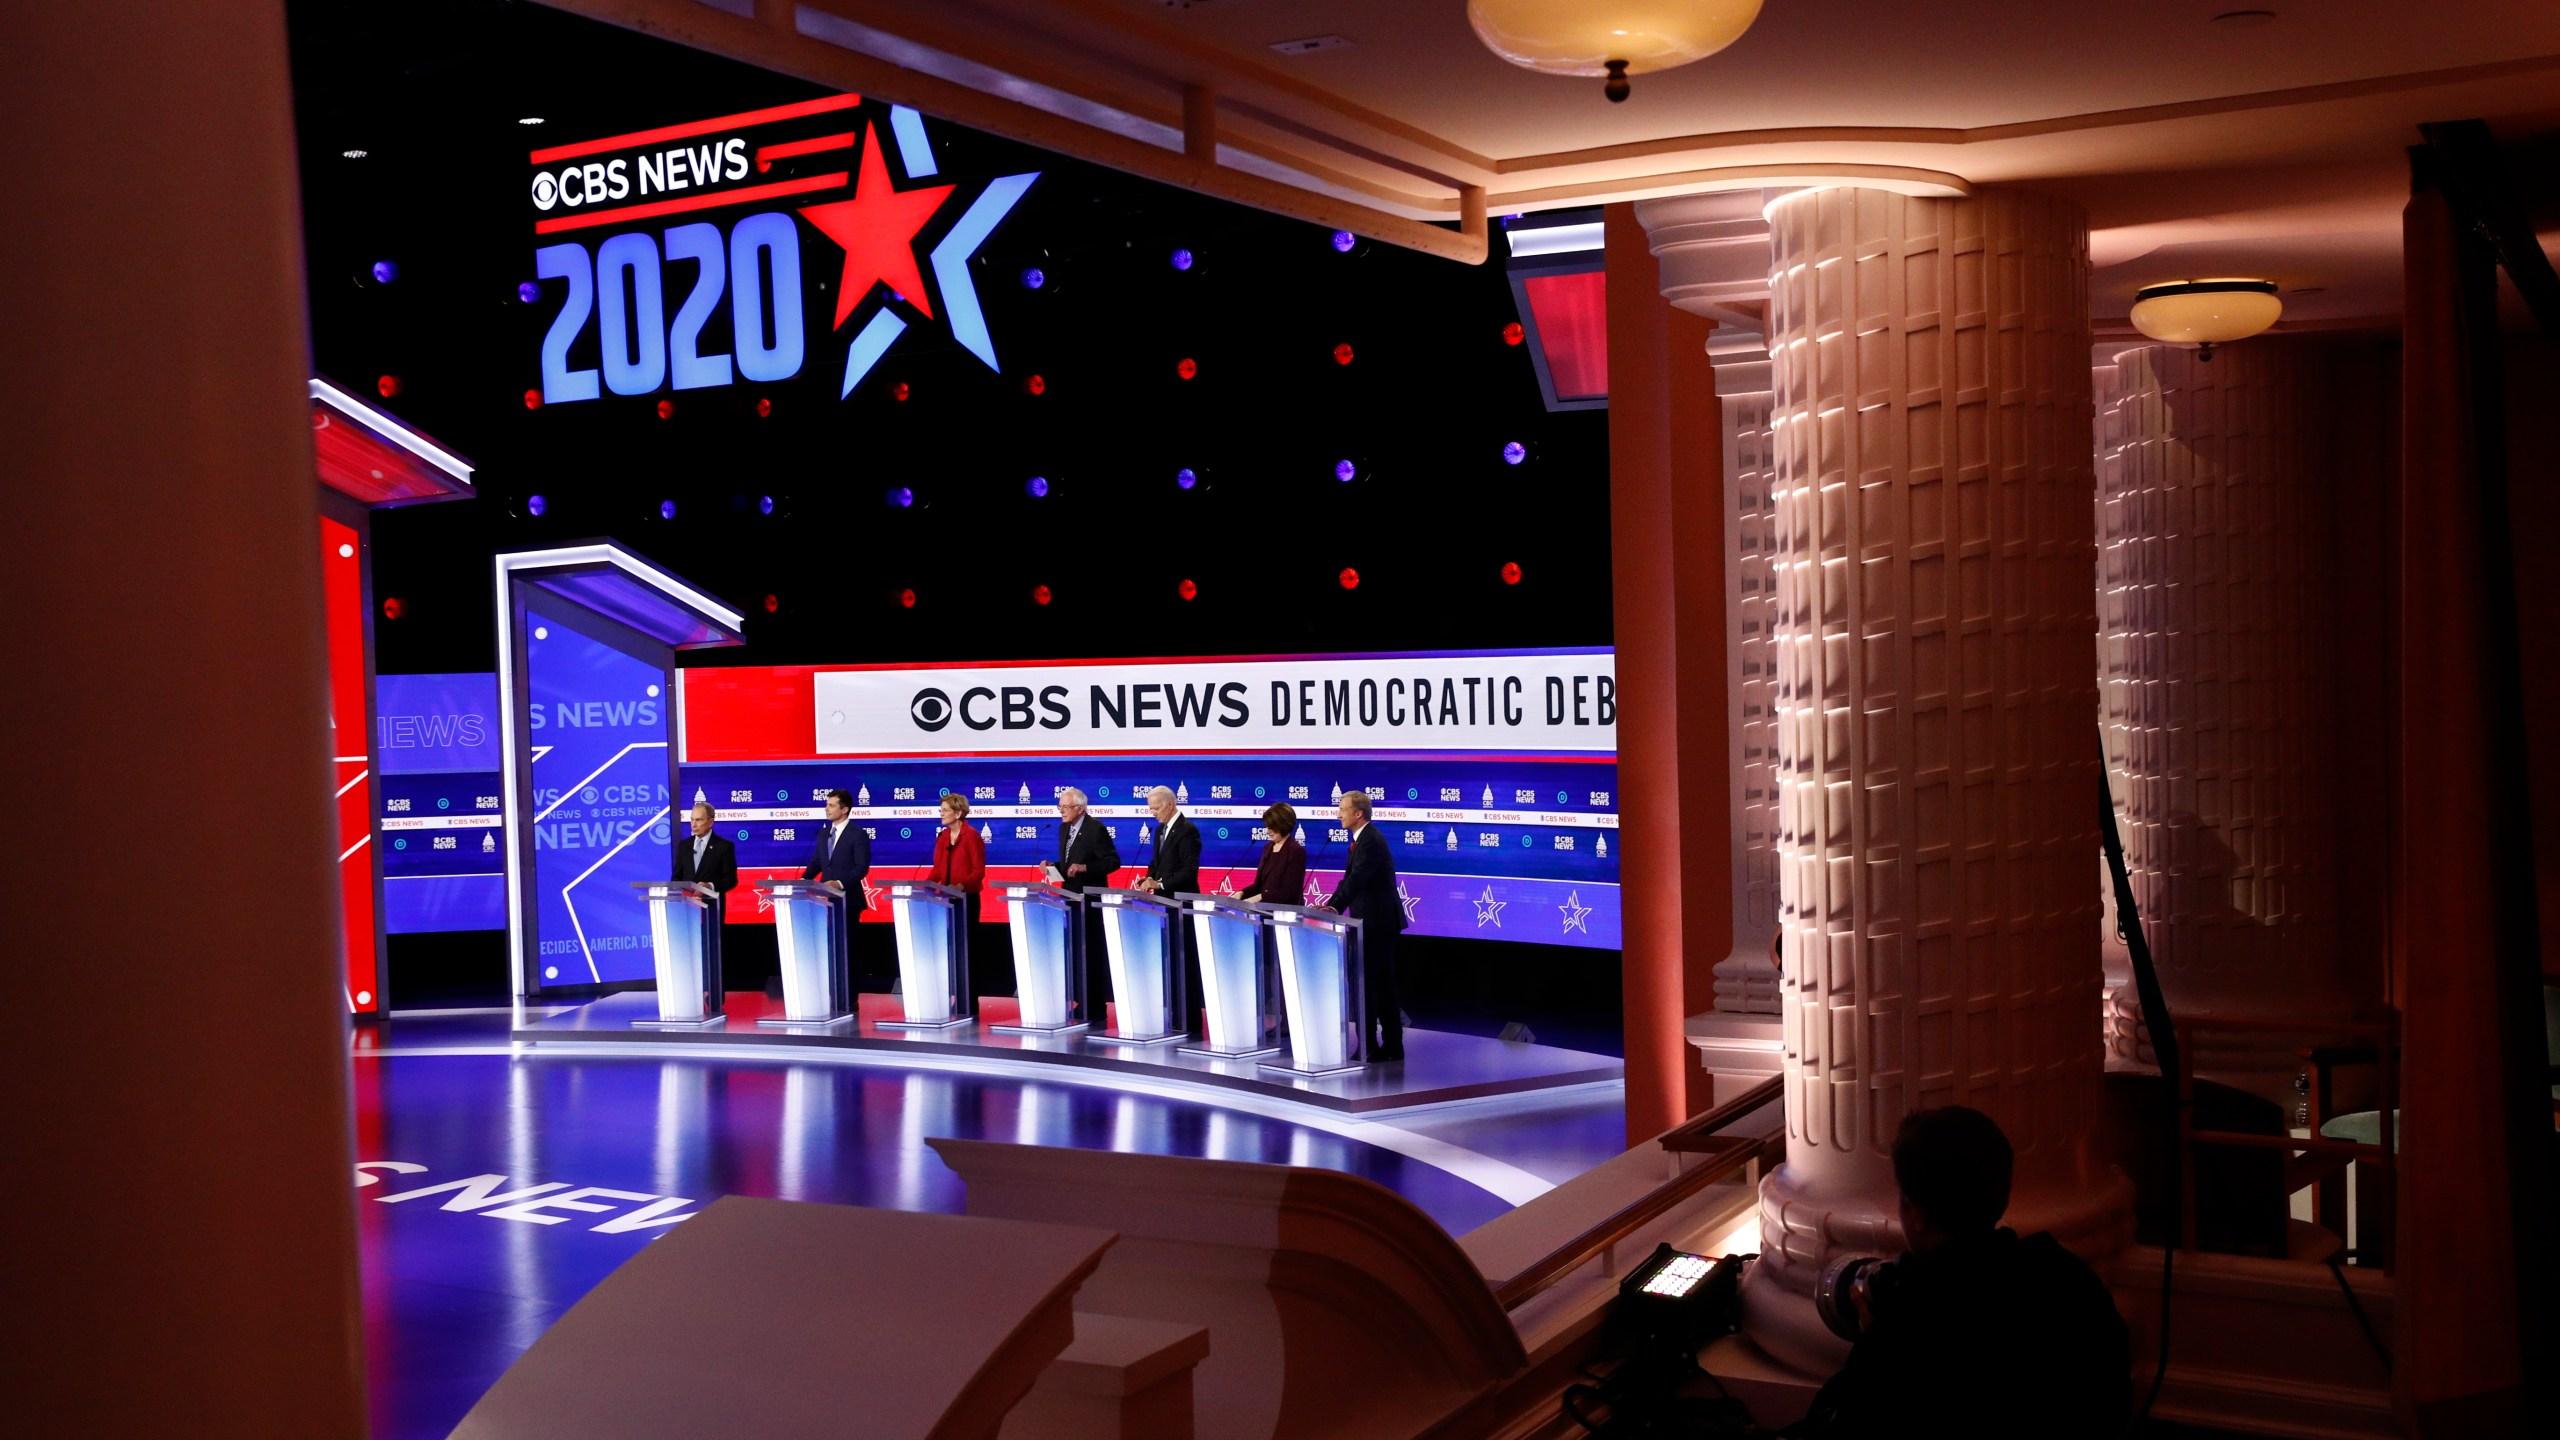 Mike Bloomberg, Pete Buttigieg, Elizabeth Warren, Bernie Sanders, Joe Biden, Amy Klobuchar, Tom Steyer